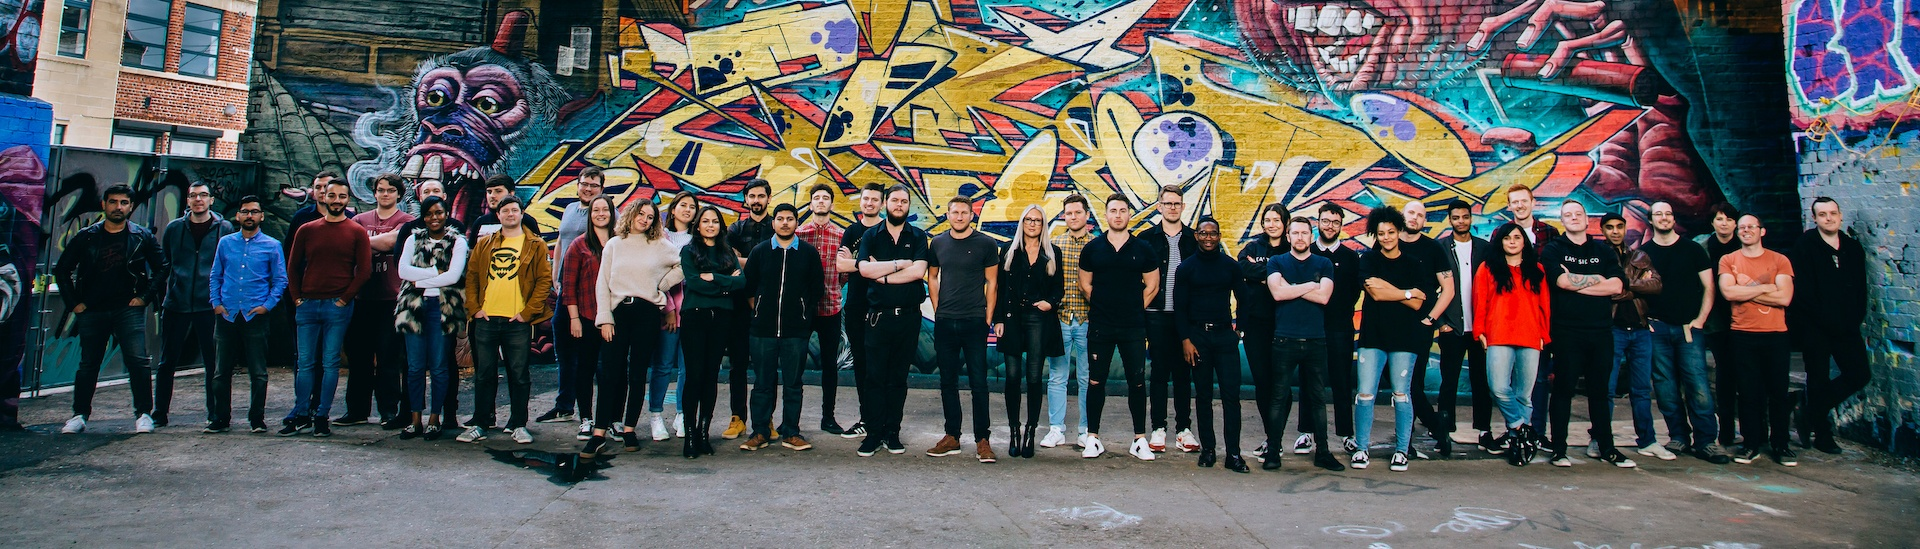 The Eastside Co Team